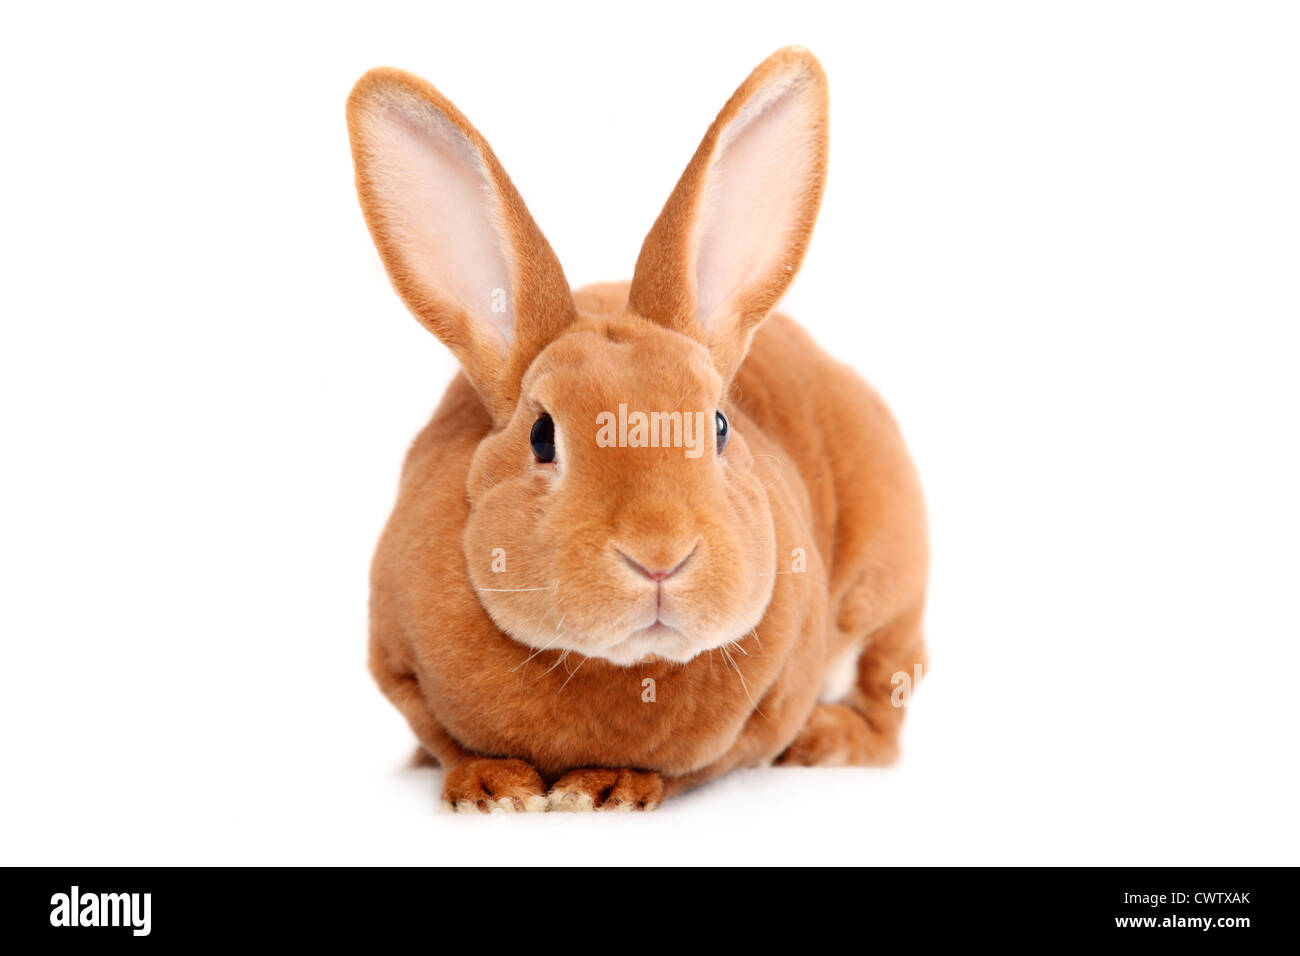 Kleinrex / Rex Bunny Stock Photo